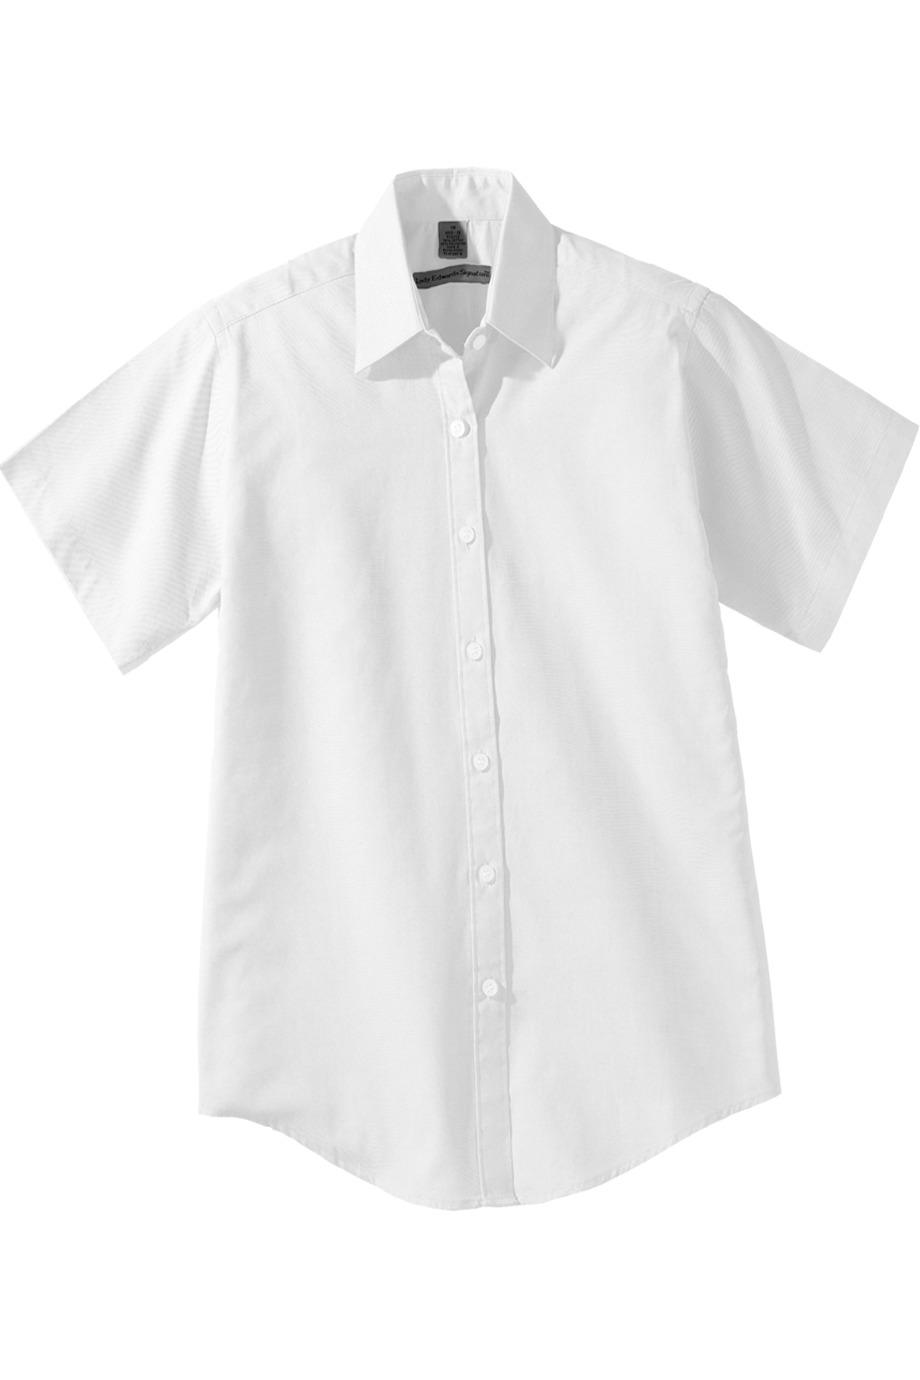 Edwards Garment 5925 女士短袖牛津布衬衣T恤